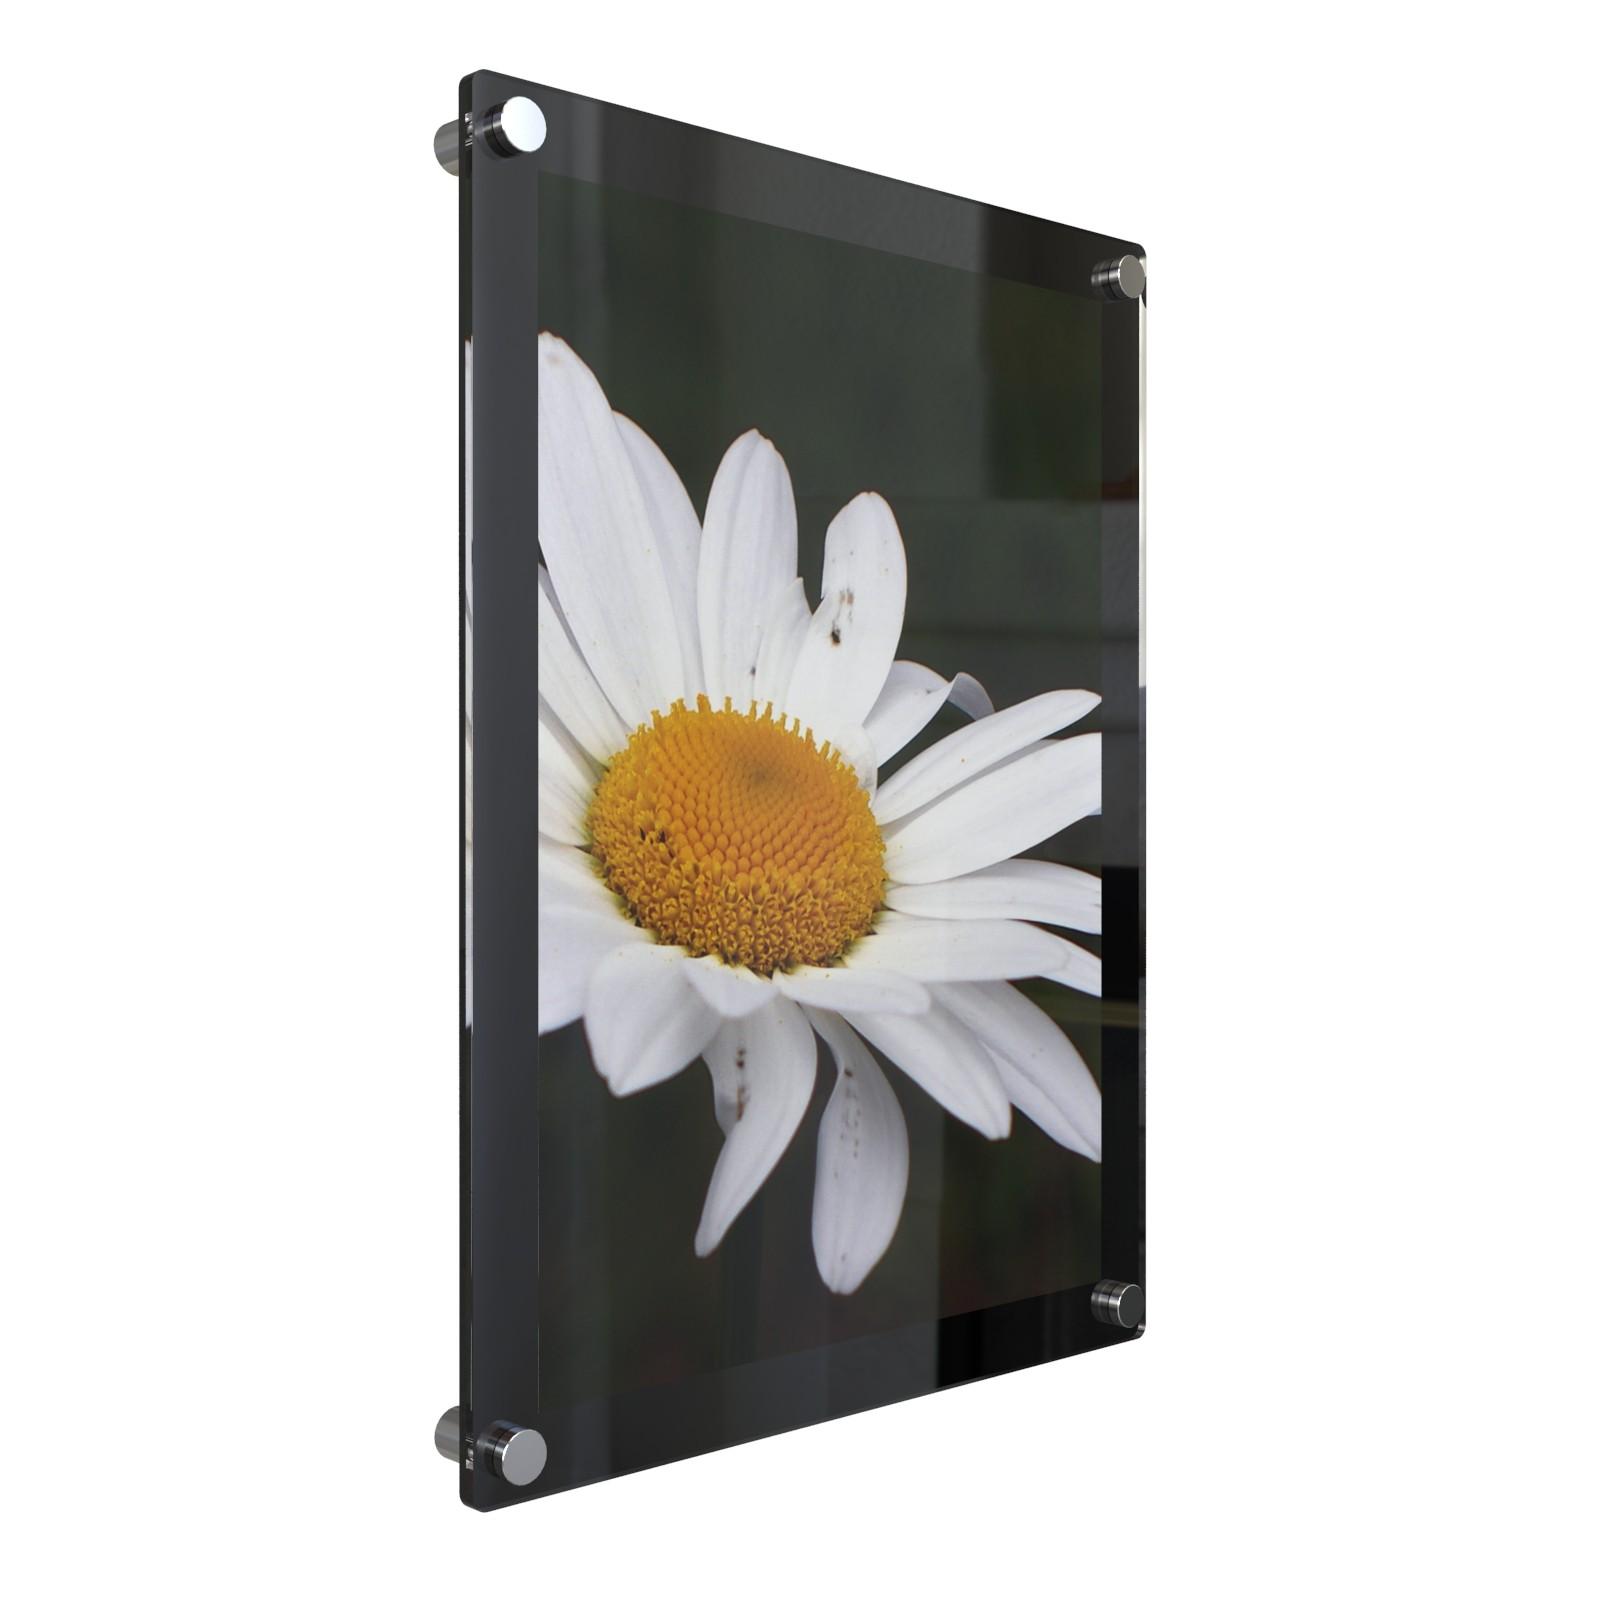 A0 กรอบรูปอะครีลิค ติดผนัง 123x90ซม.สีดำ Black Acrylic Wall Mounted Photo Frame 123x90cm.(for A0)